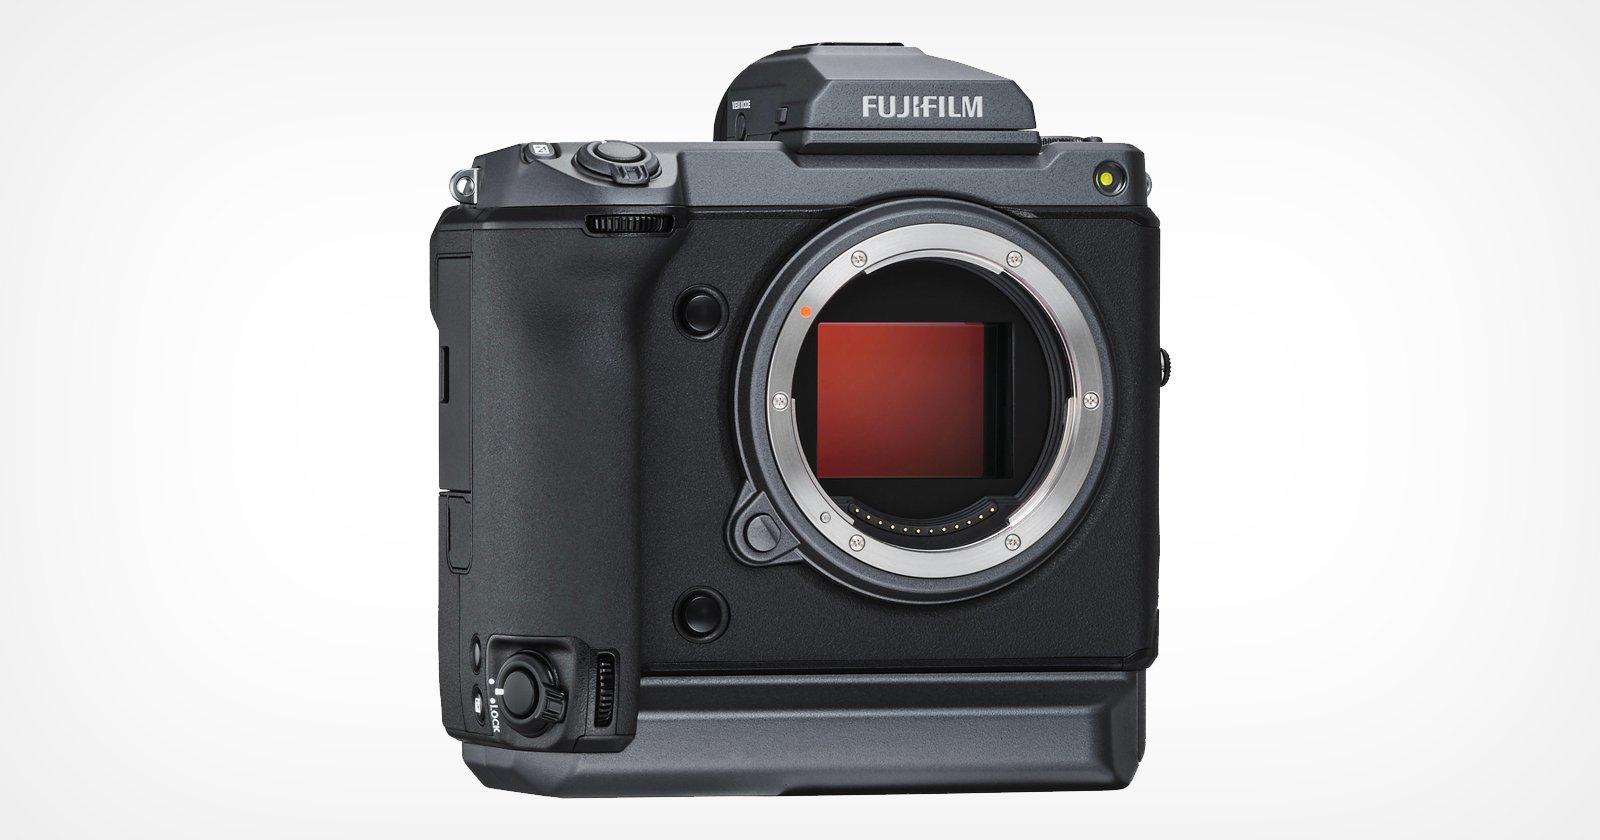 Fujifilm Adds Pixel Shift Multi-Shot to GFX100, Enabling 400 MP Capture - PetaPixel